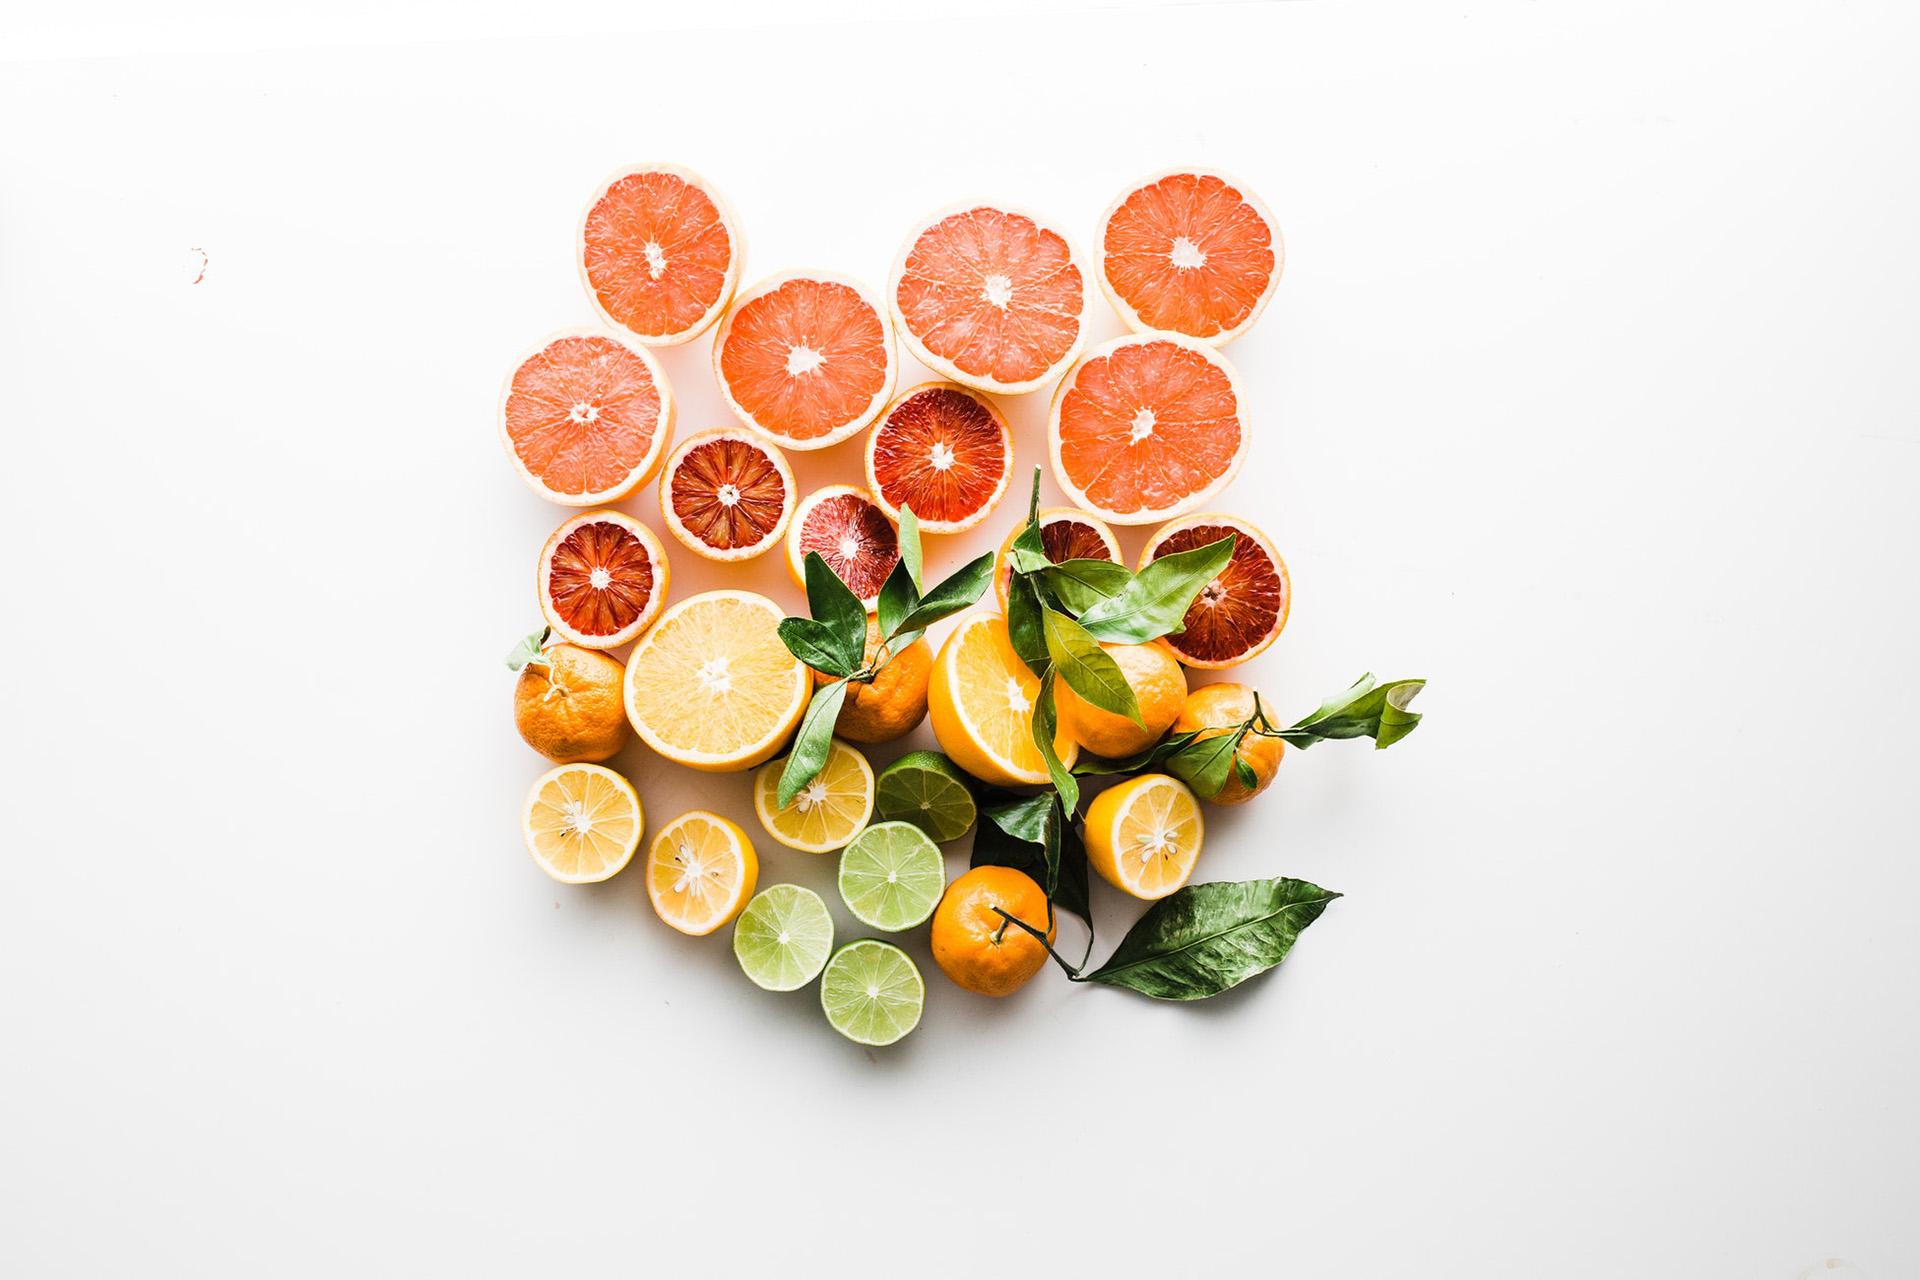 Ce fel de alimente să consumi vara